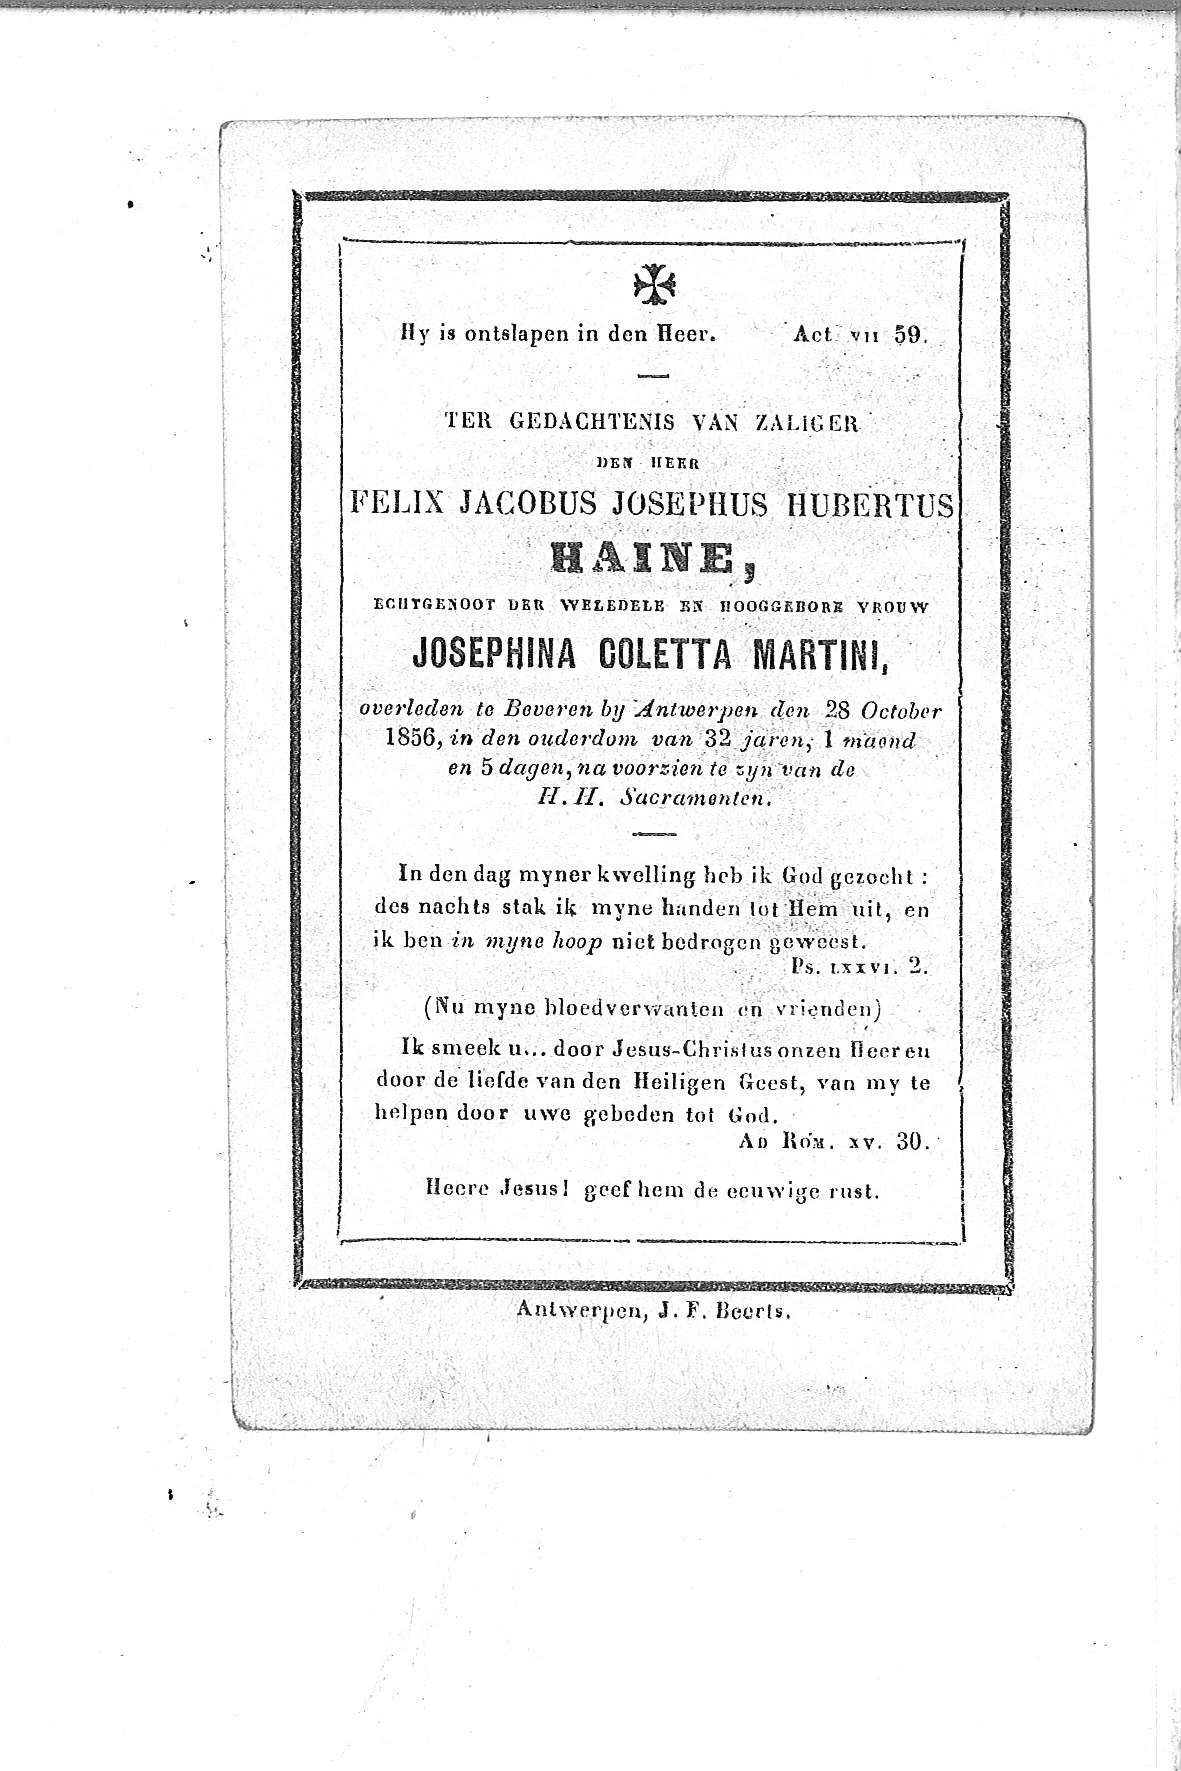 Felix-Jacobus-Josephus-Hubertus-(1856)-20121011095319_00059.jpg